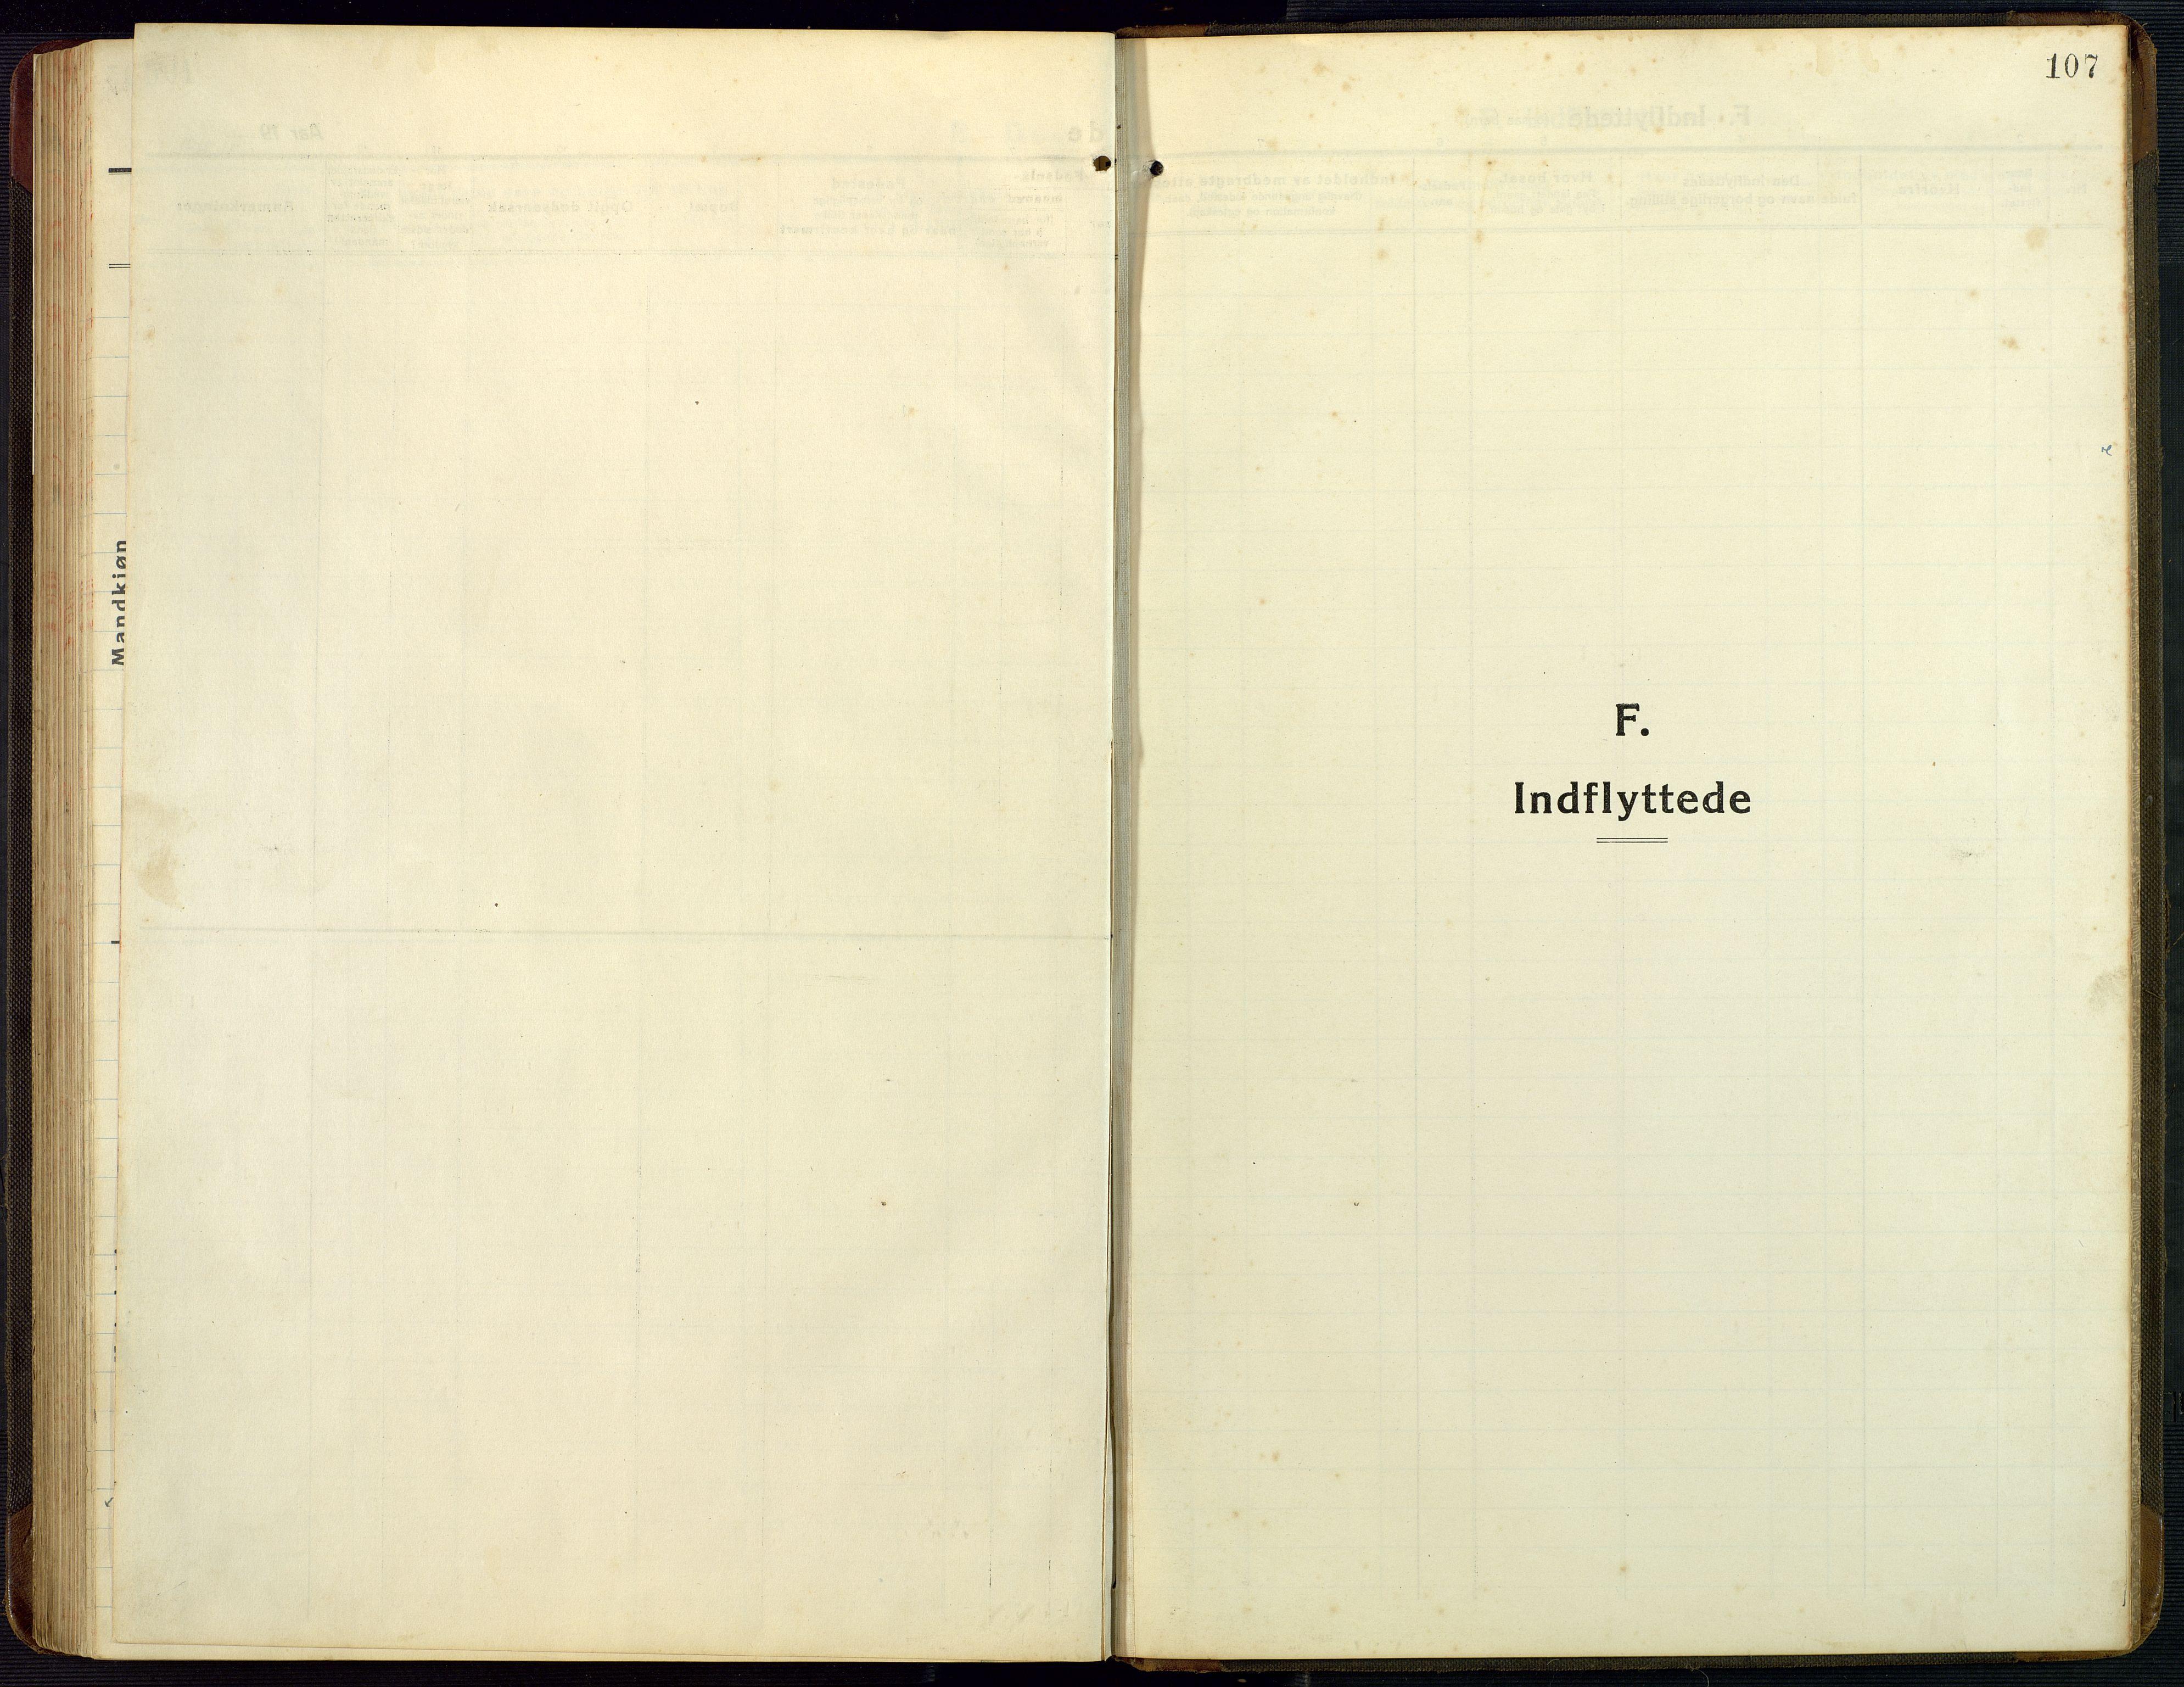 SAK, Bygland sokneprestkontor, F/Fb/Fba/L0003: Klokkerbok nr. B 3, 1920-1974, s. 107